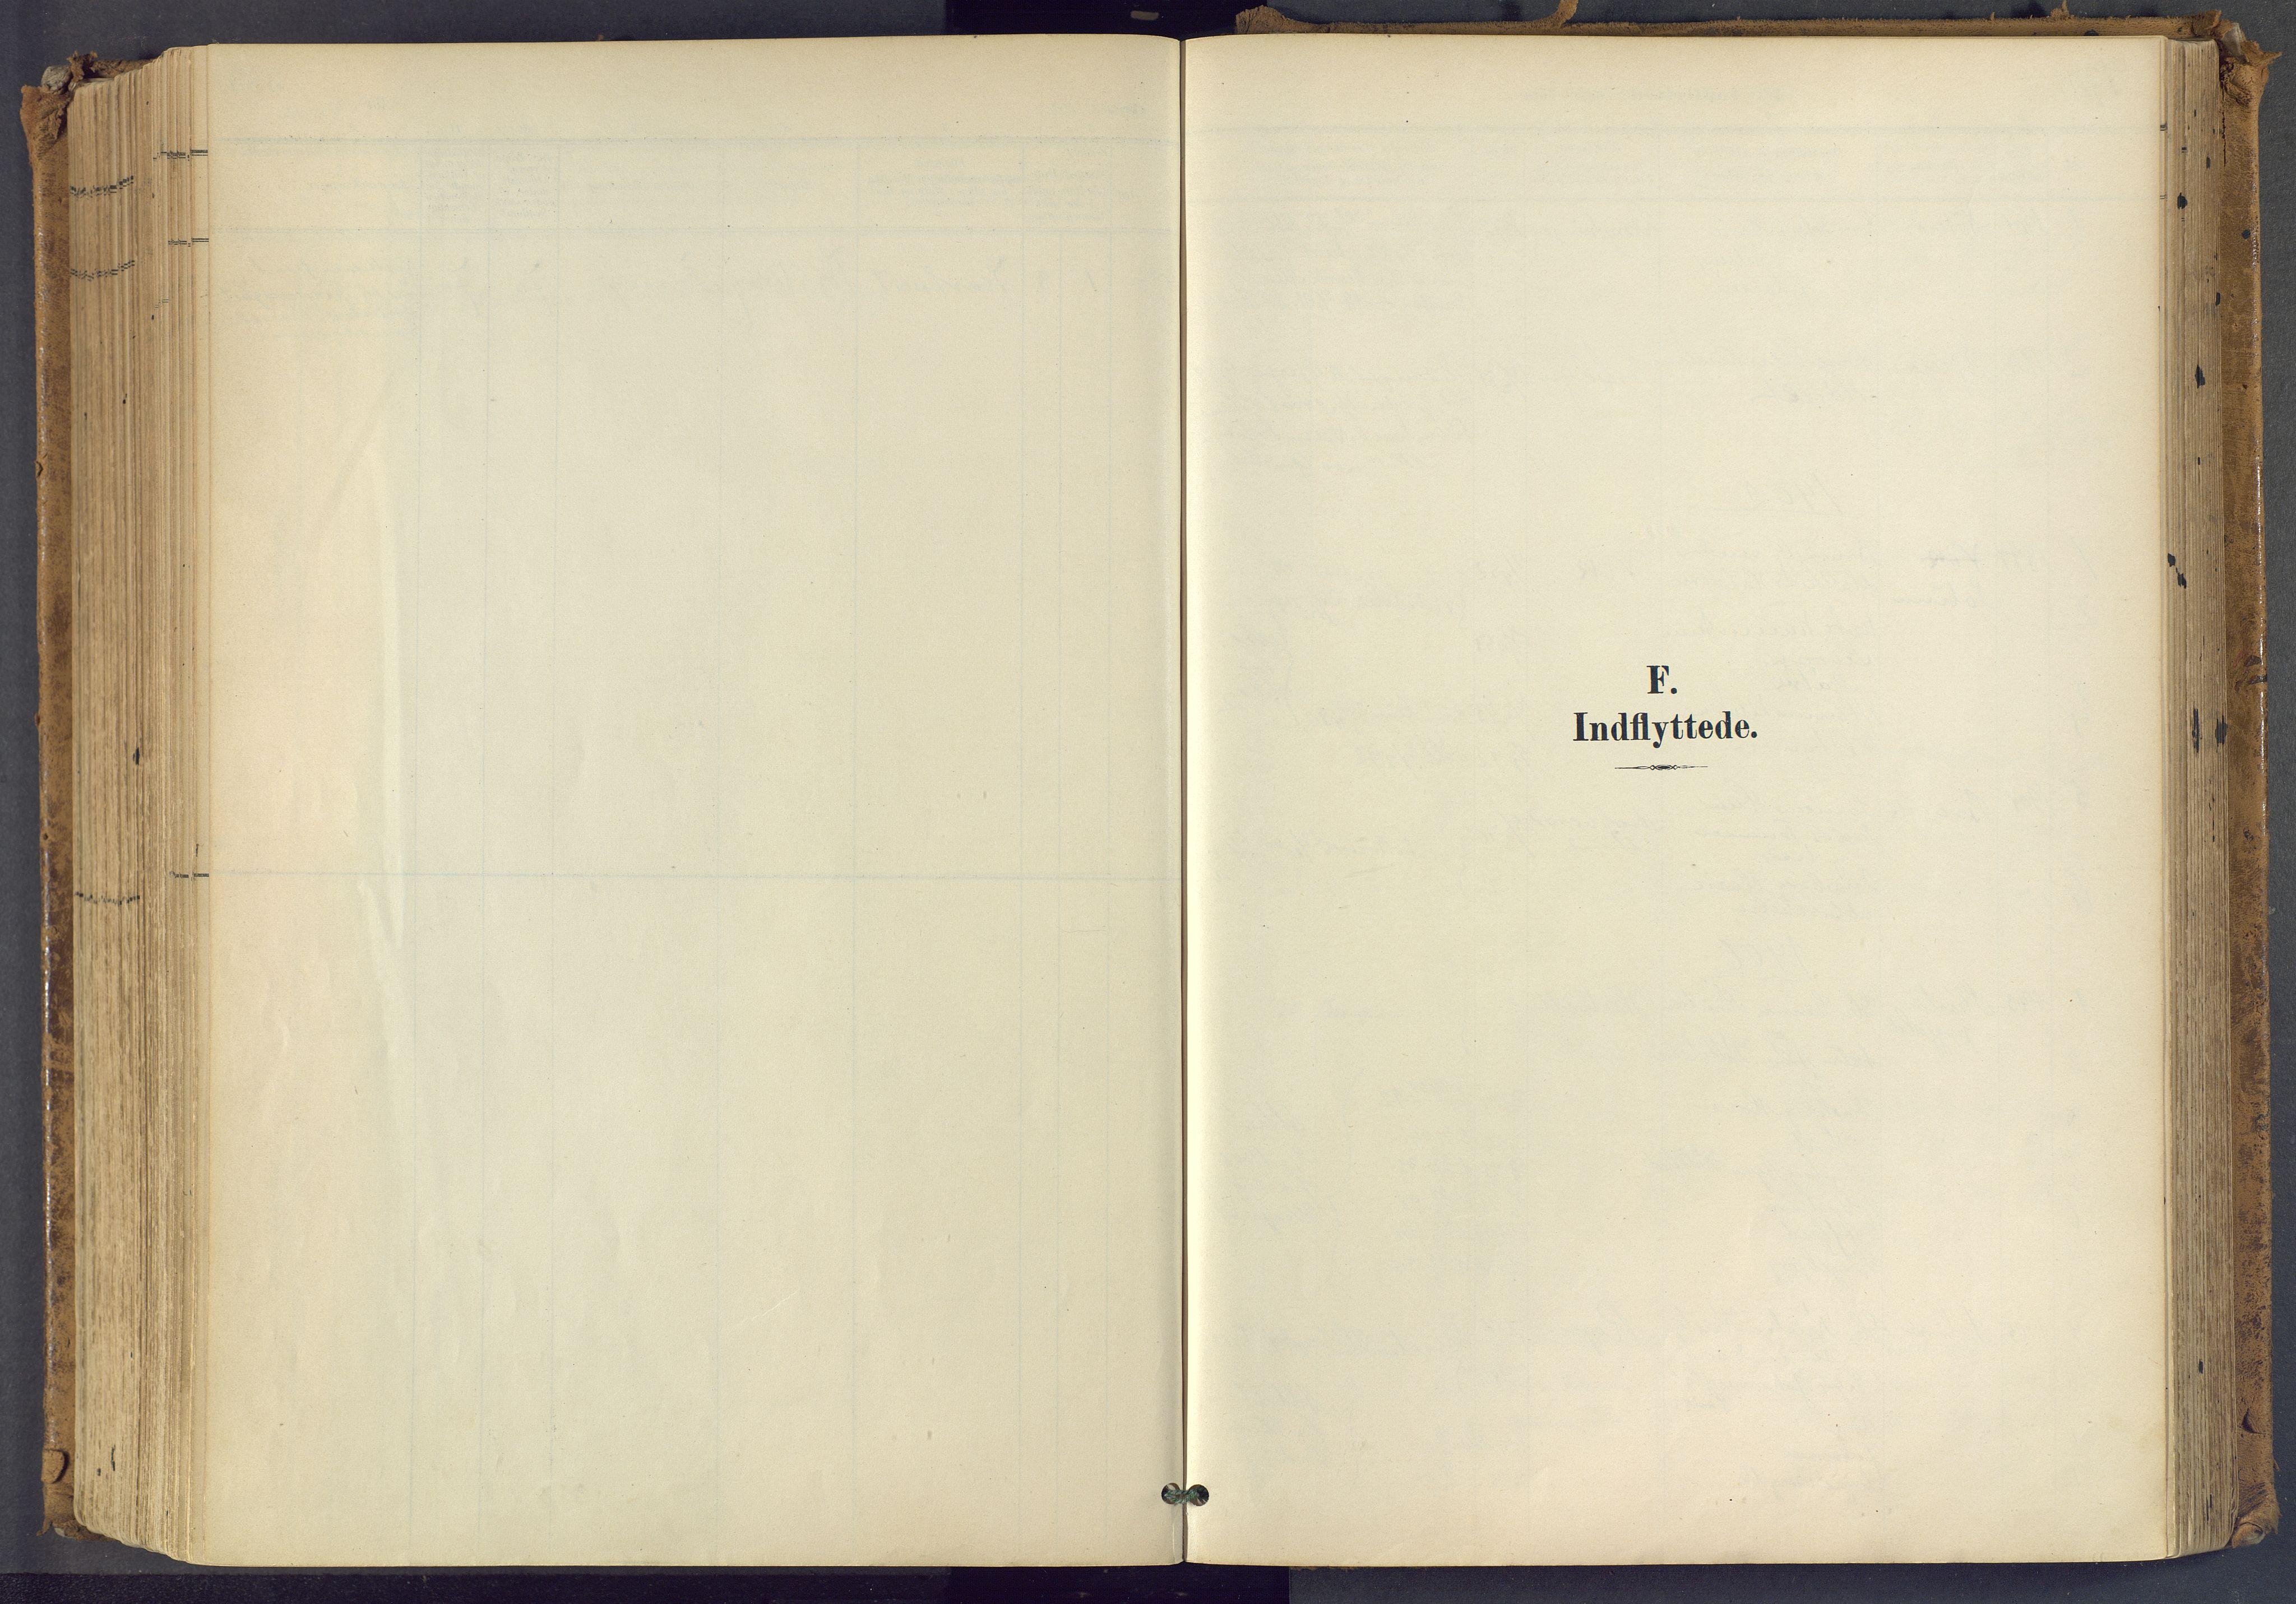 SAKO, Bamble kirkebøker, F/Fa/L0009: Ministerialbok nr. I 9, 1901-1917